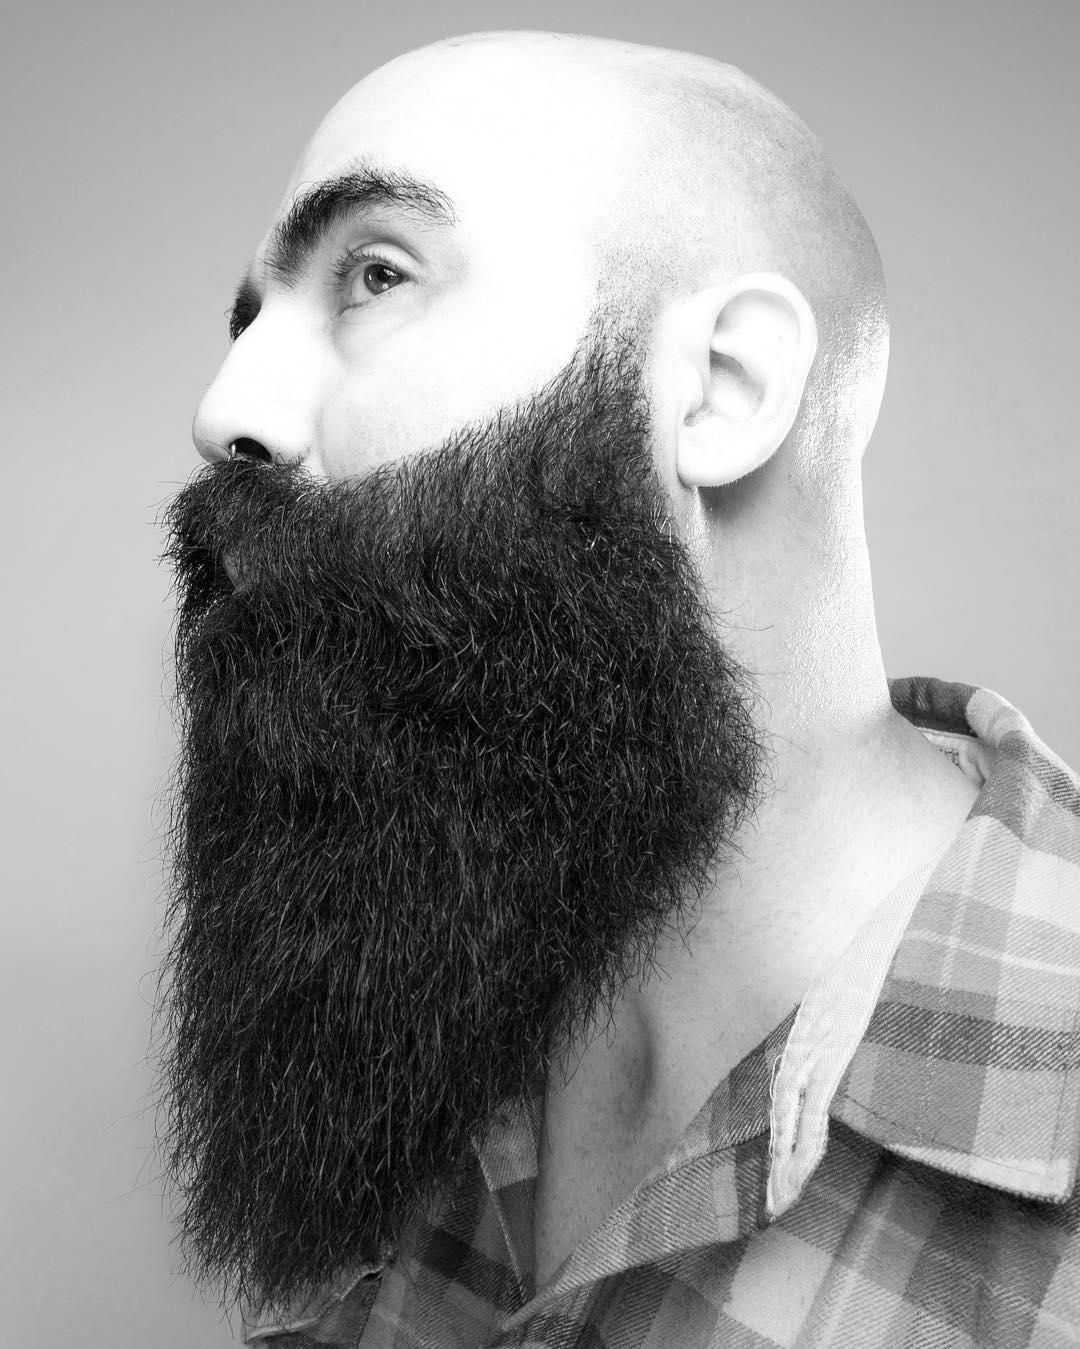 Awe Inspiring Top 15 Beard Styles For 2020 Natural Hairstyles Runnerswayorg